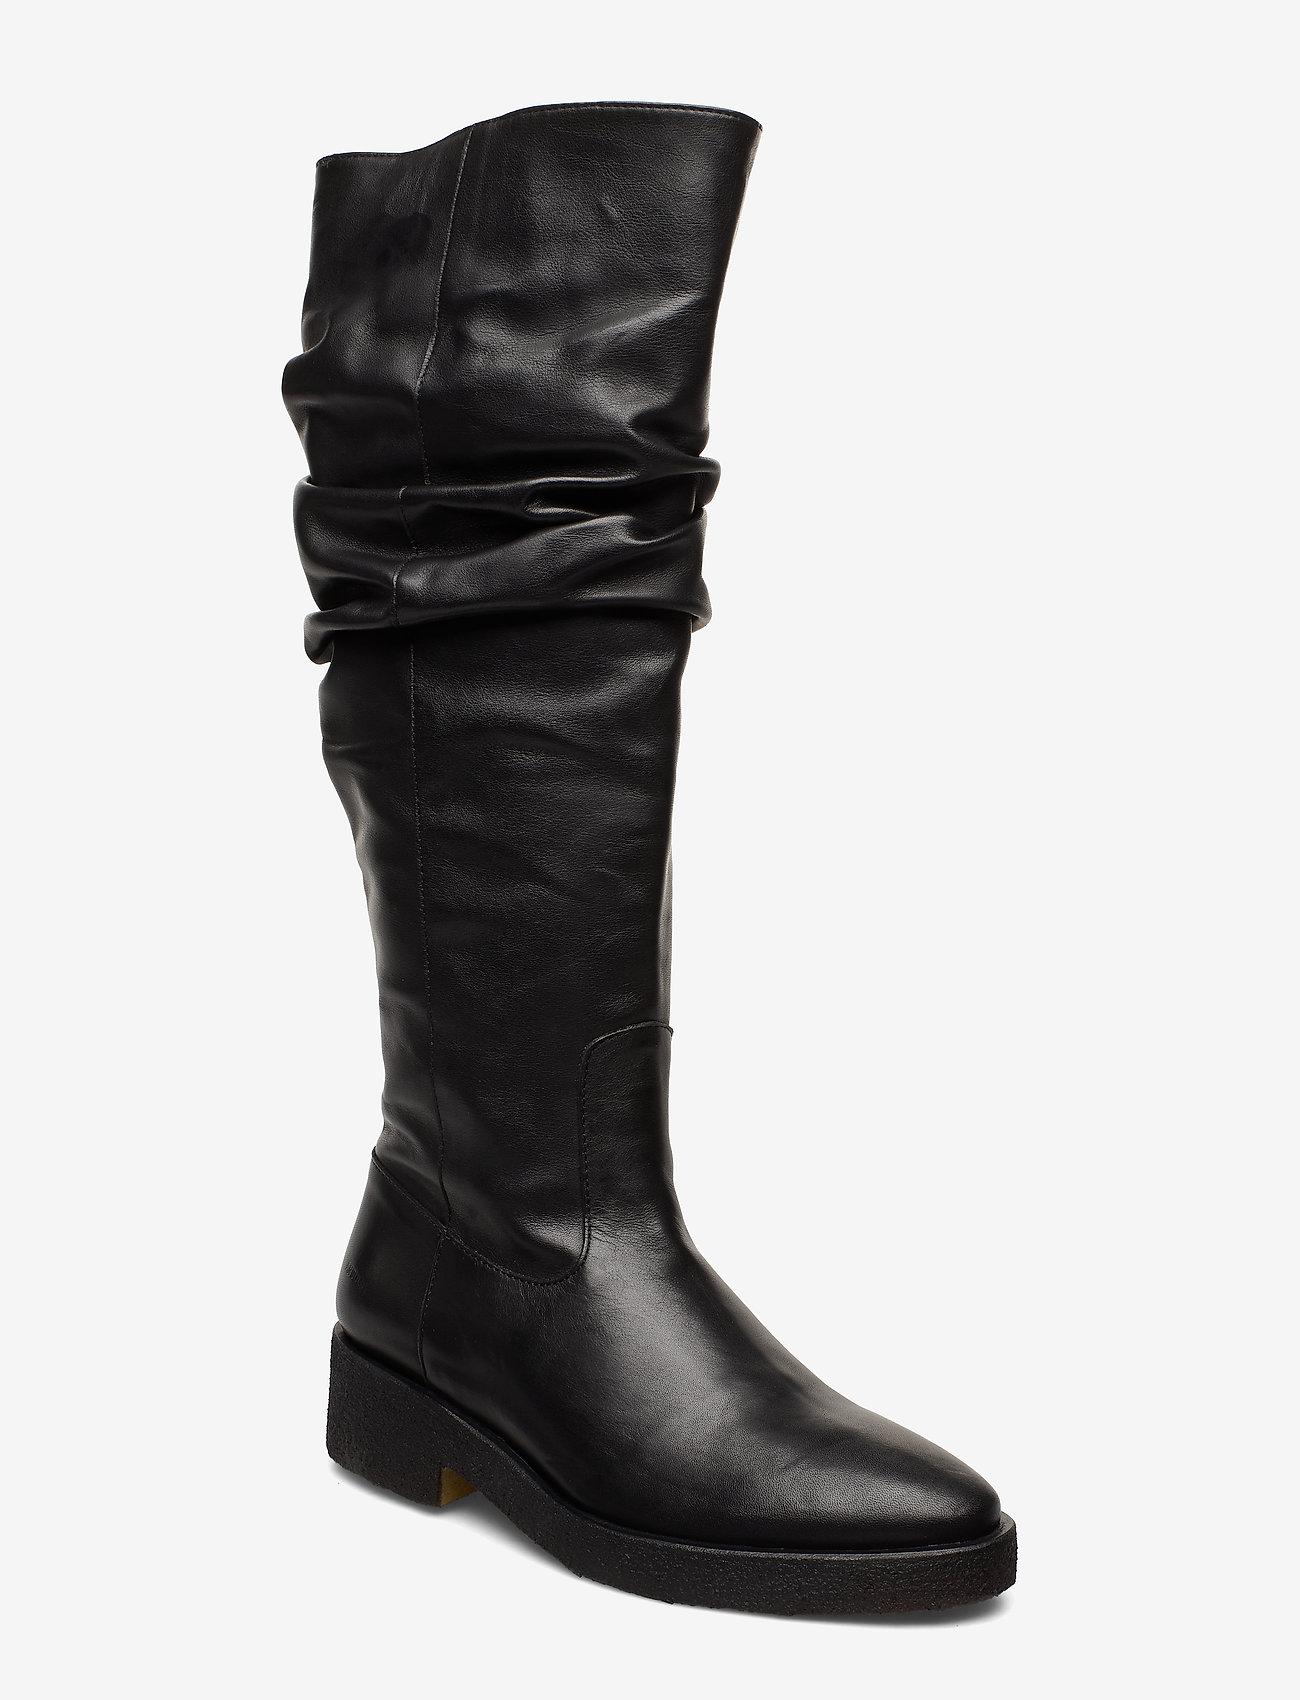 ANGULUS - Booties - flat - with zipper - bottes hautes - 1604 black - 0